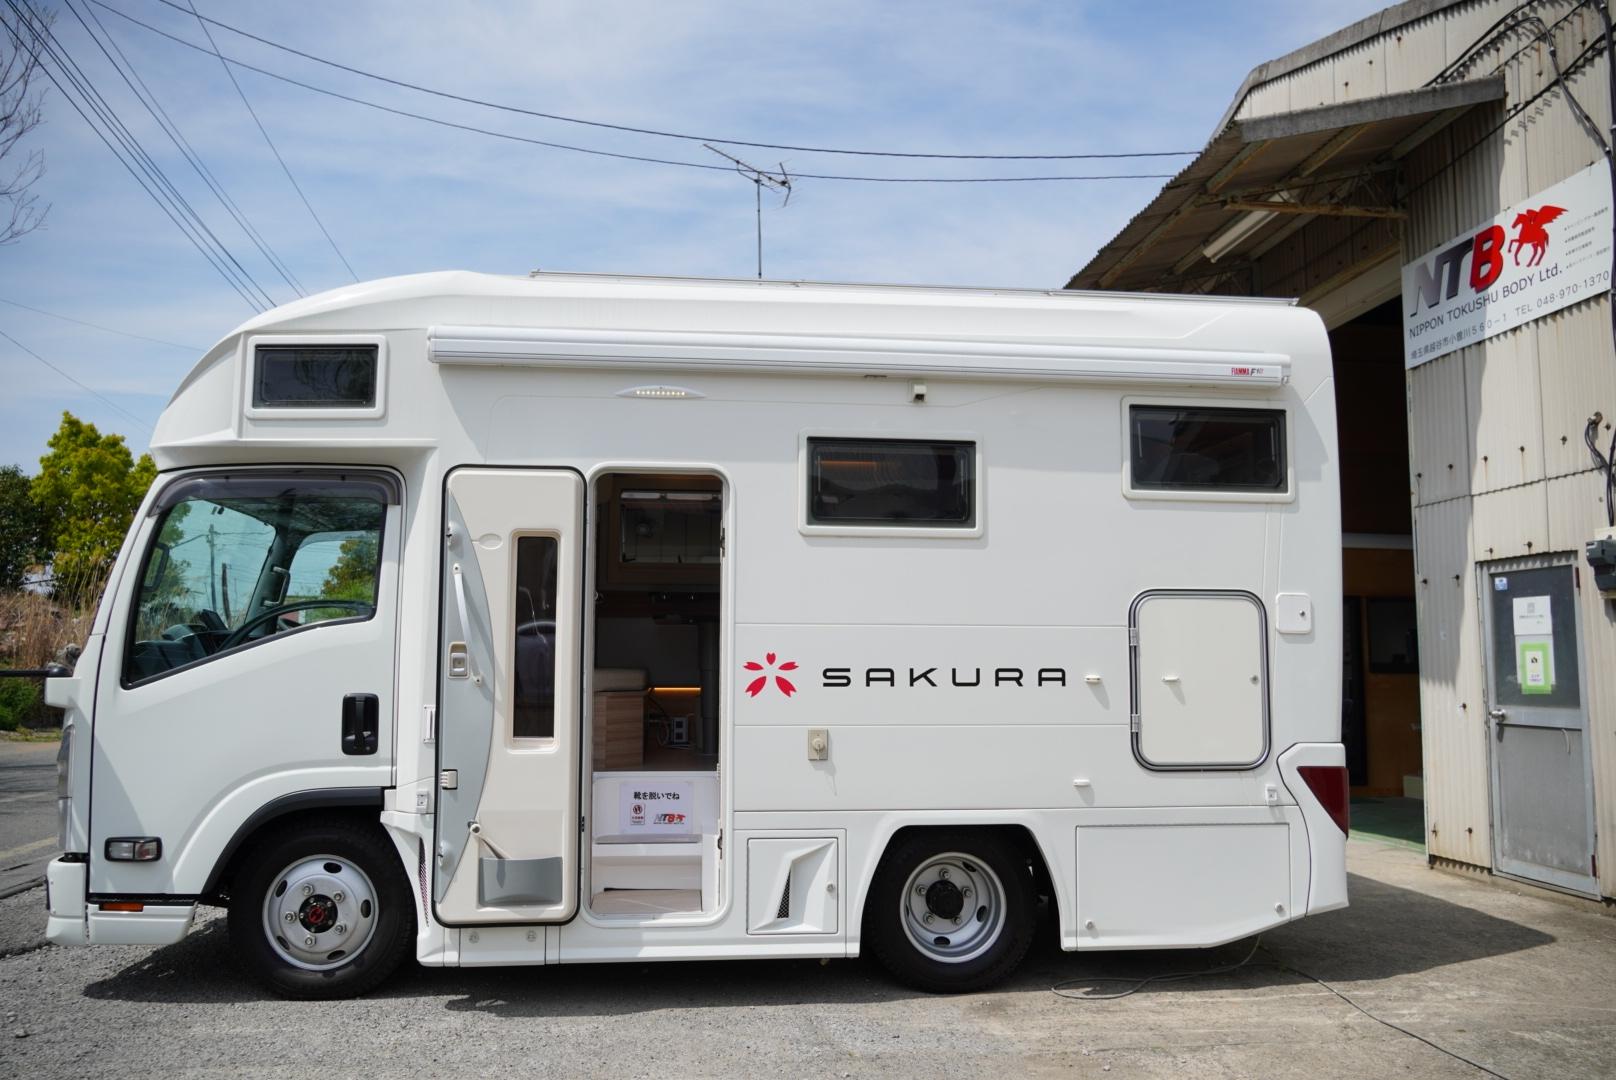 Sakura キャンピングカー 安心・安全を追求したキャブコン「新型サクラ」がデビュー! キャンピングカースタイル